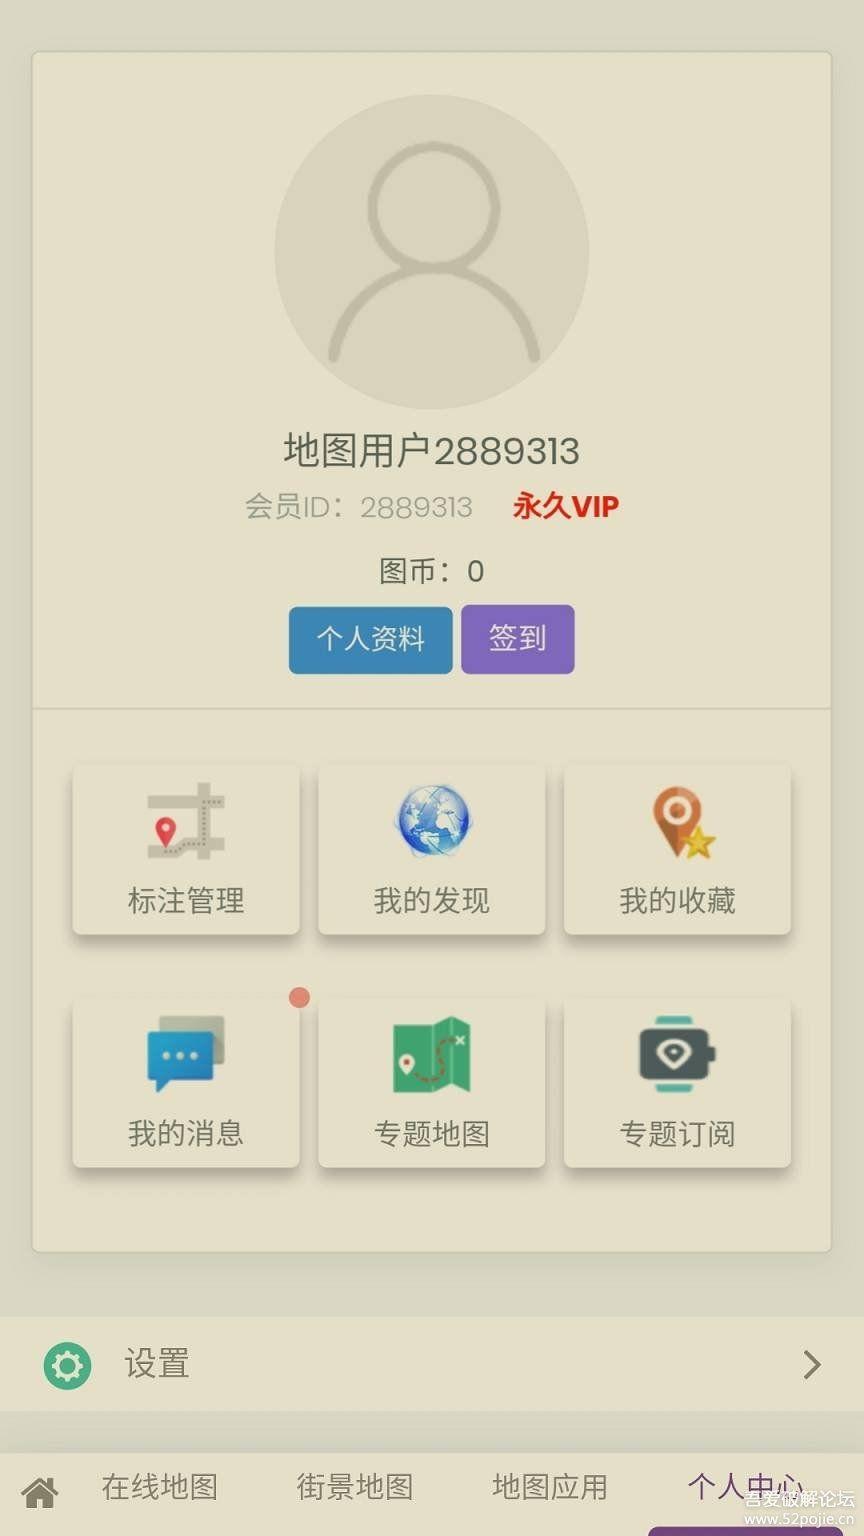 [Android]一起看地图V9.9.9 .9.9 地图街景,想看哪看哪